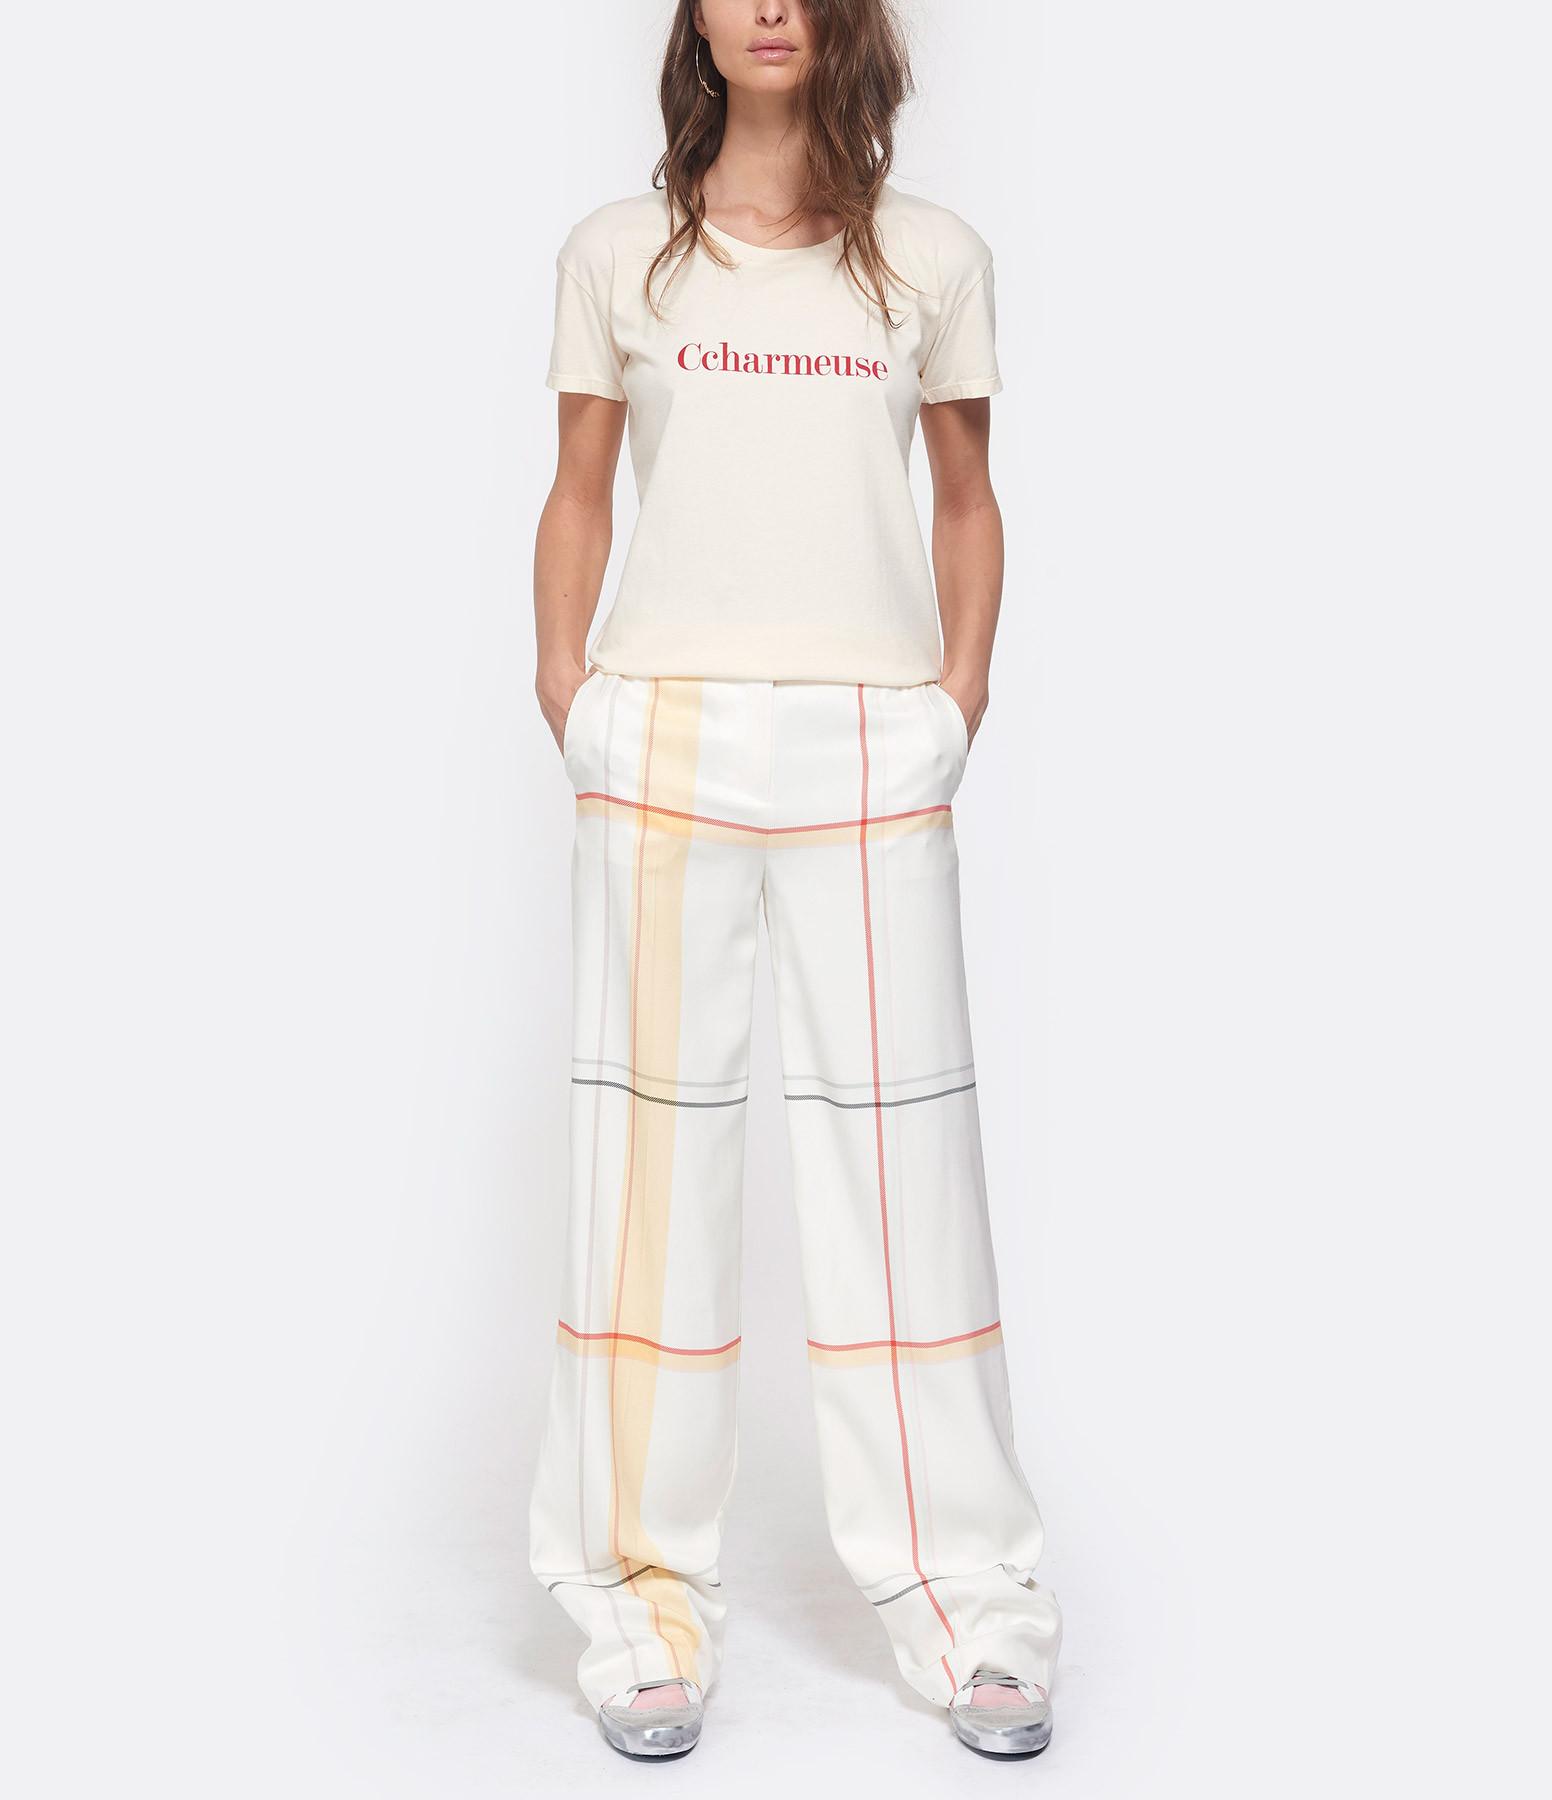 VANESSA BRUNO - Tee-shirt Ccharmeuse Coton Ivoire